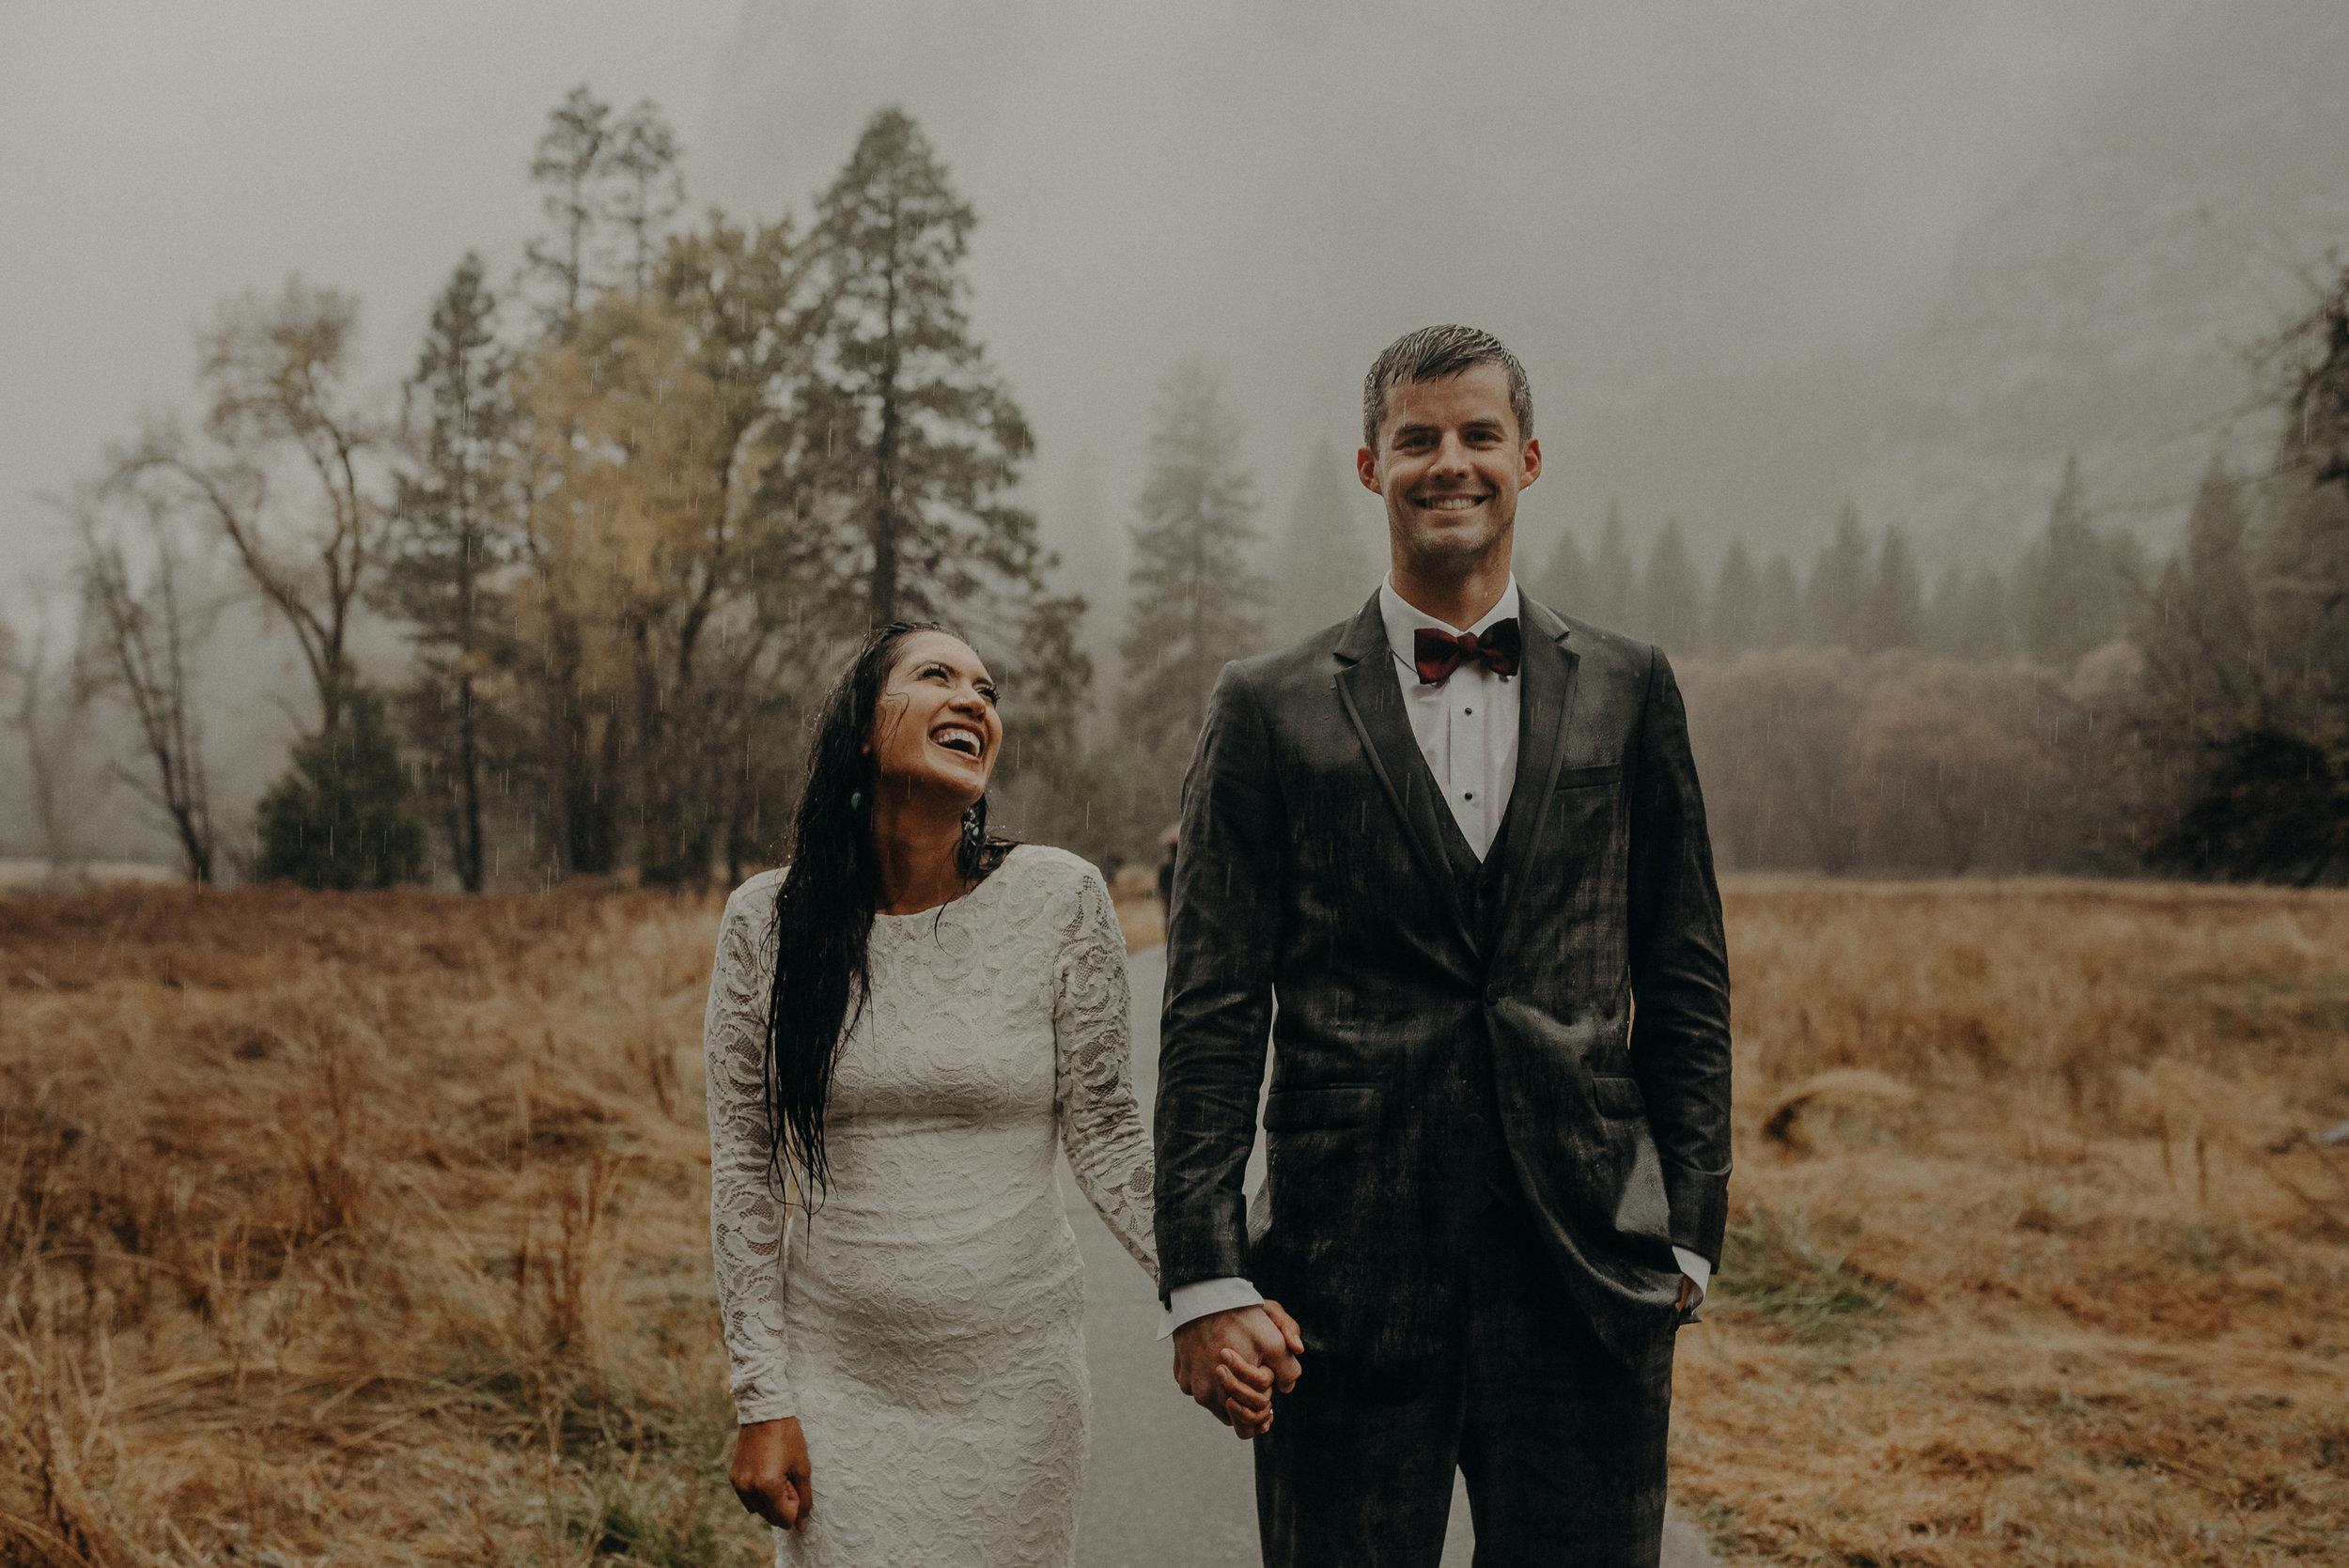 Isaiah + Taylor Photography - Yosemite Elopement - Los Angeles Wedding Photographer-81.jpg